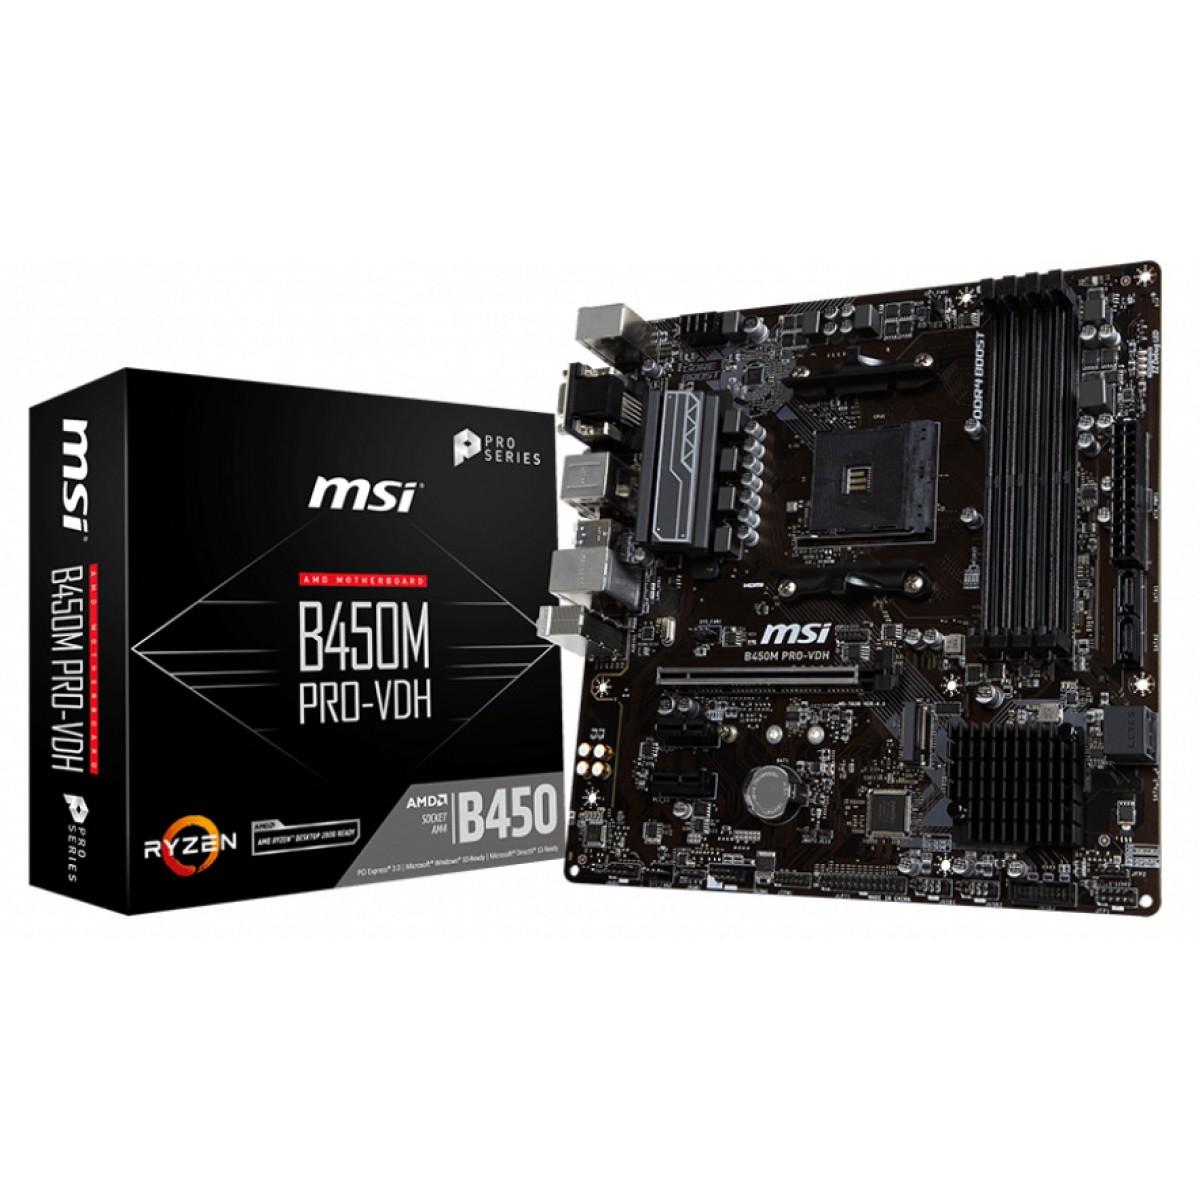 Placa Mãe MSI B450M PRO-VDH, Chipset B450, AMD AM4, mATX, DDR4